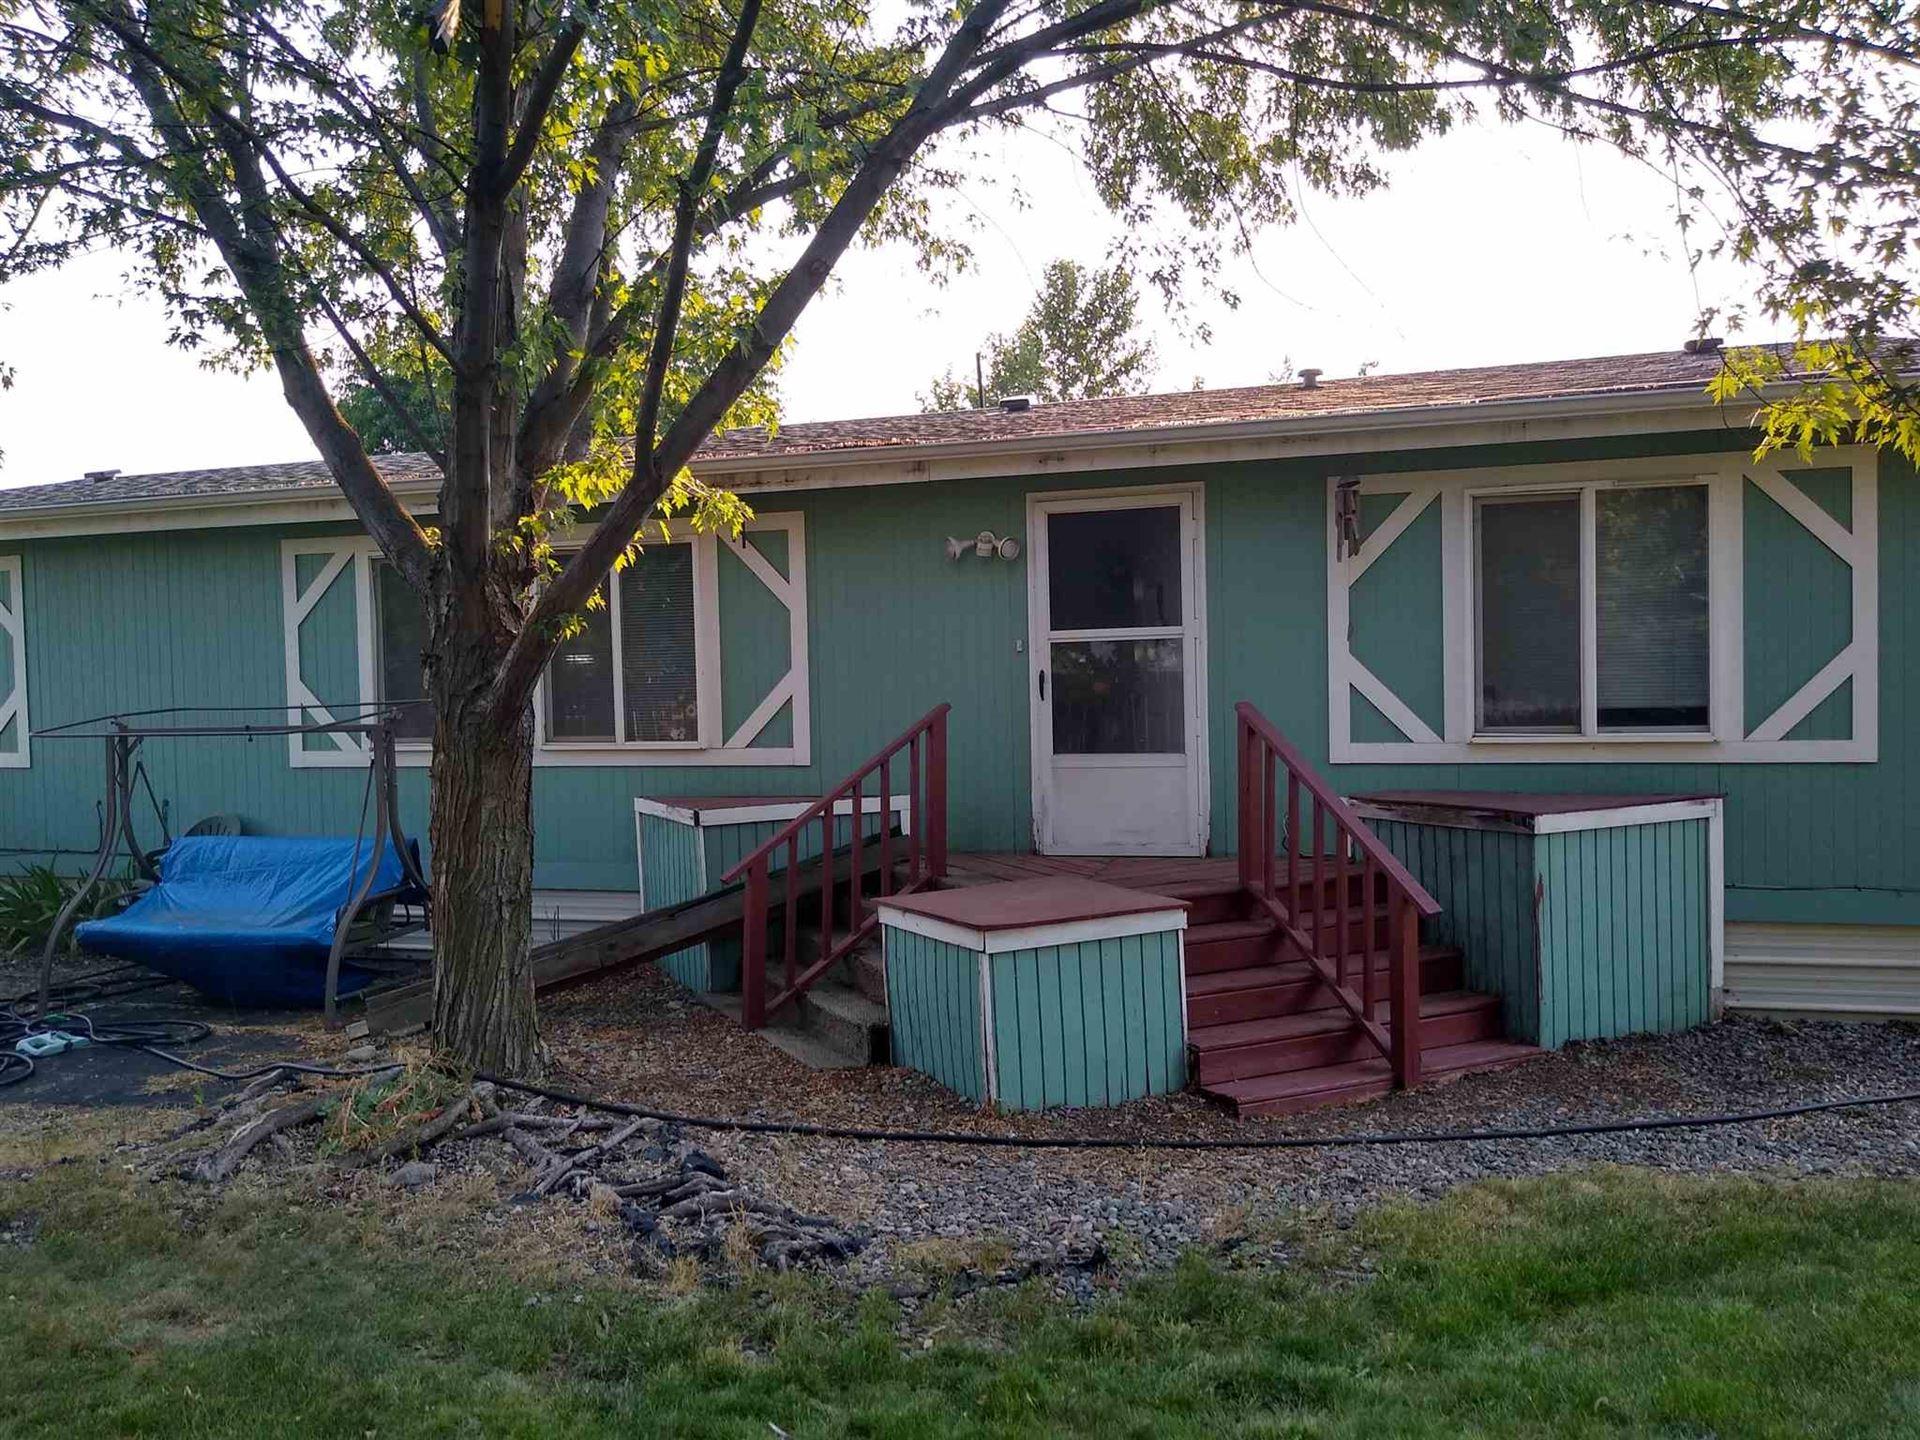 18804 E Valleyway Ct, Spokane Valley, WA 99016 - #: 202120505